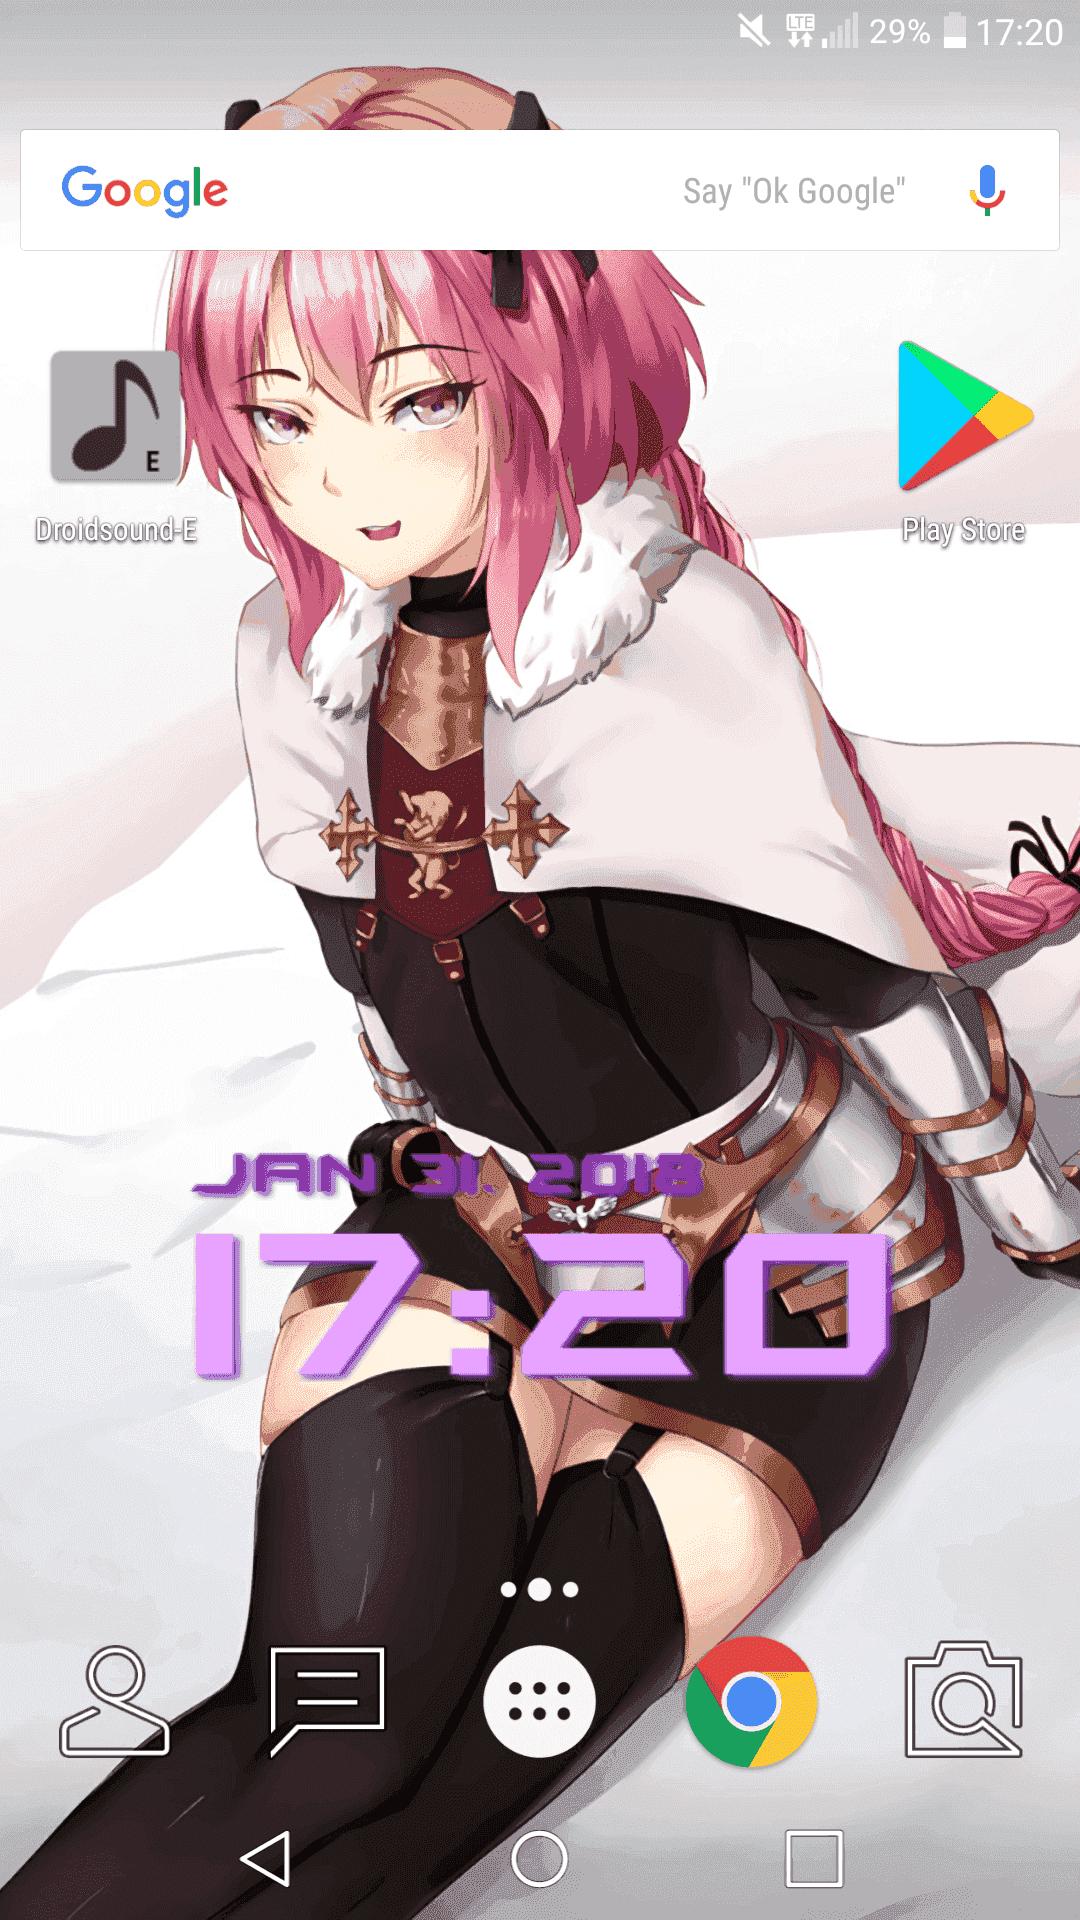 Screenshot_2018-01-31-17-20-26.png